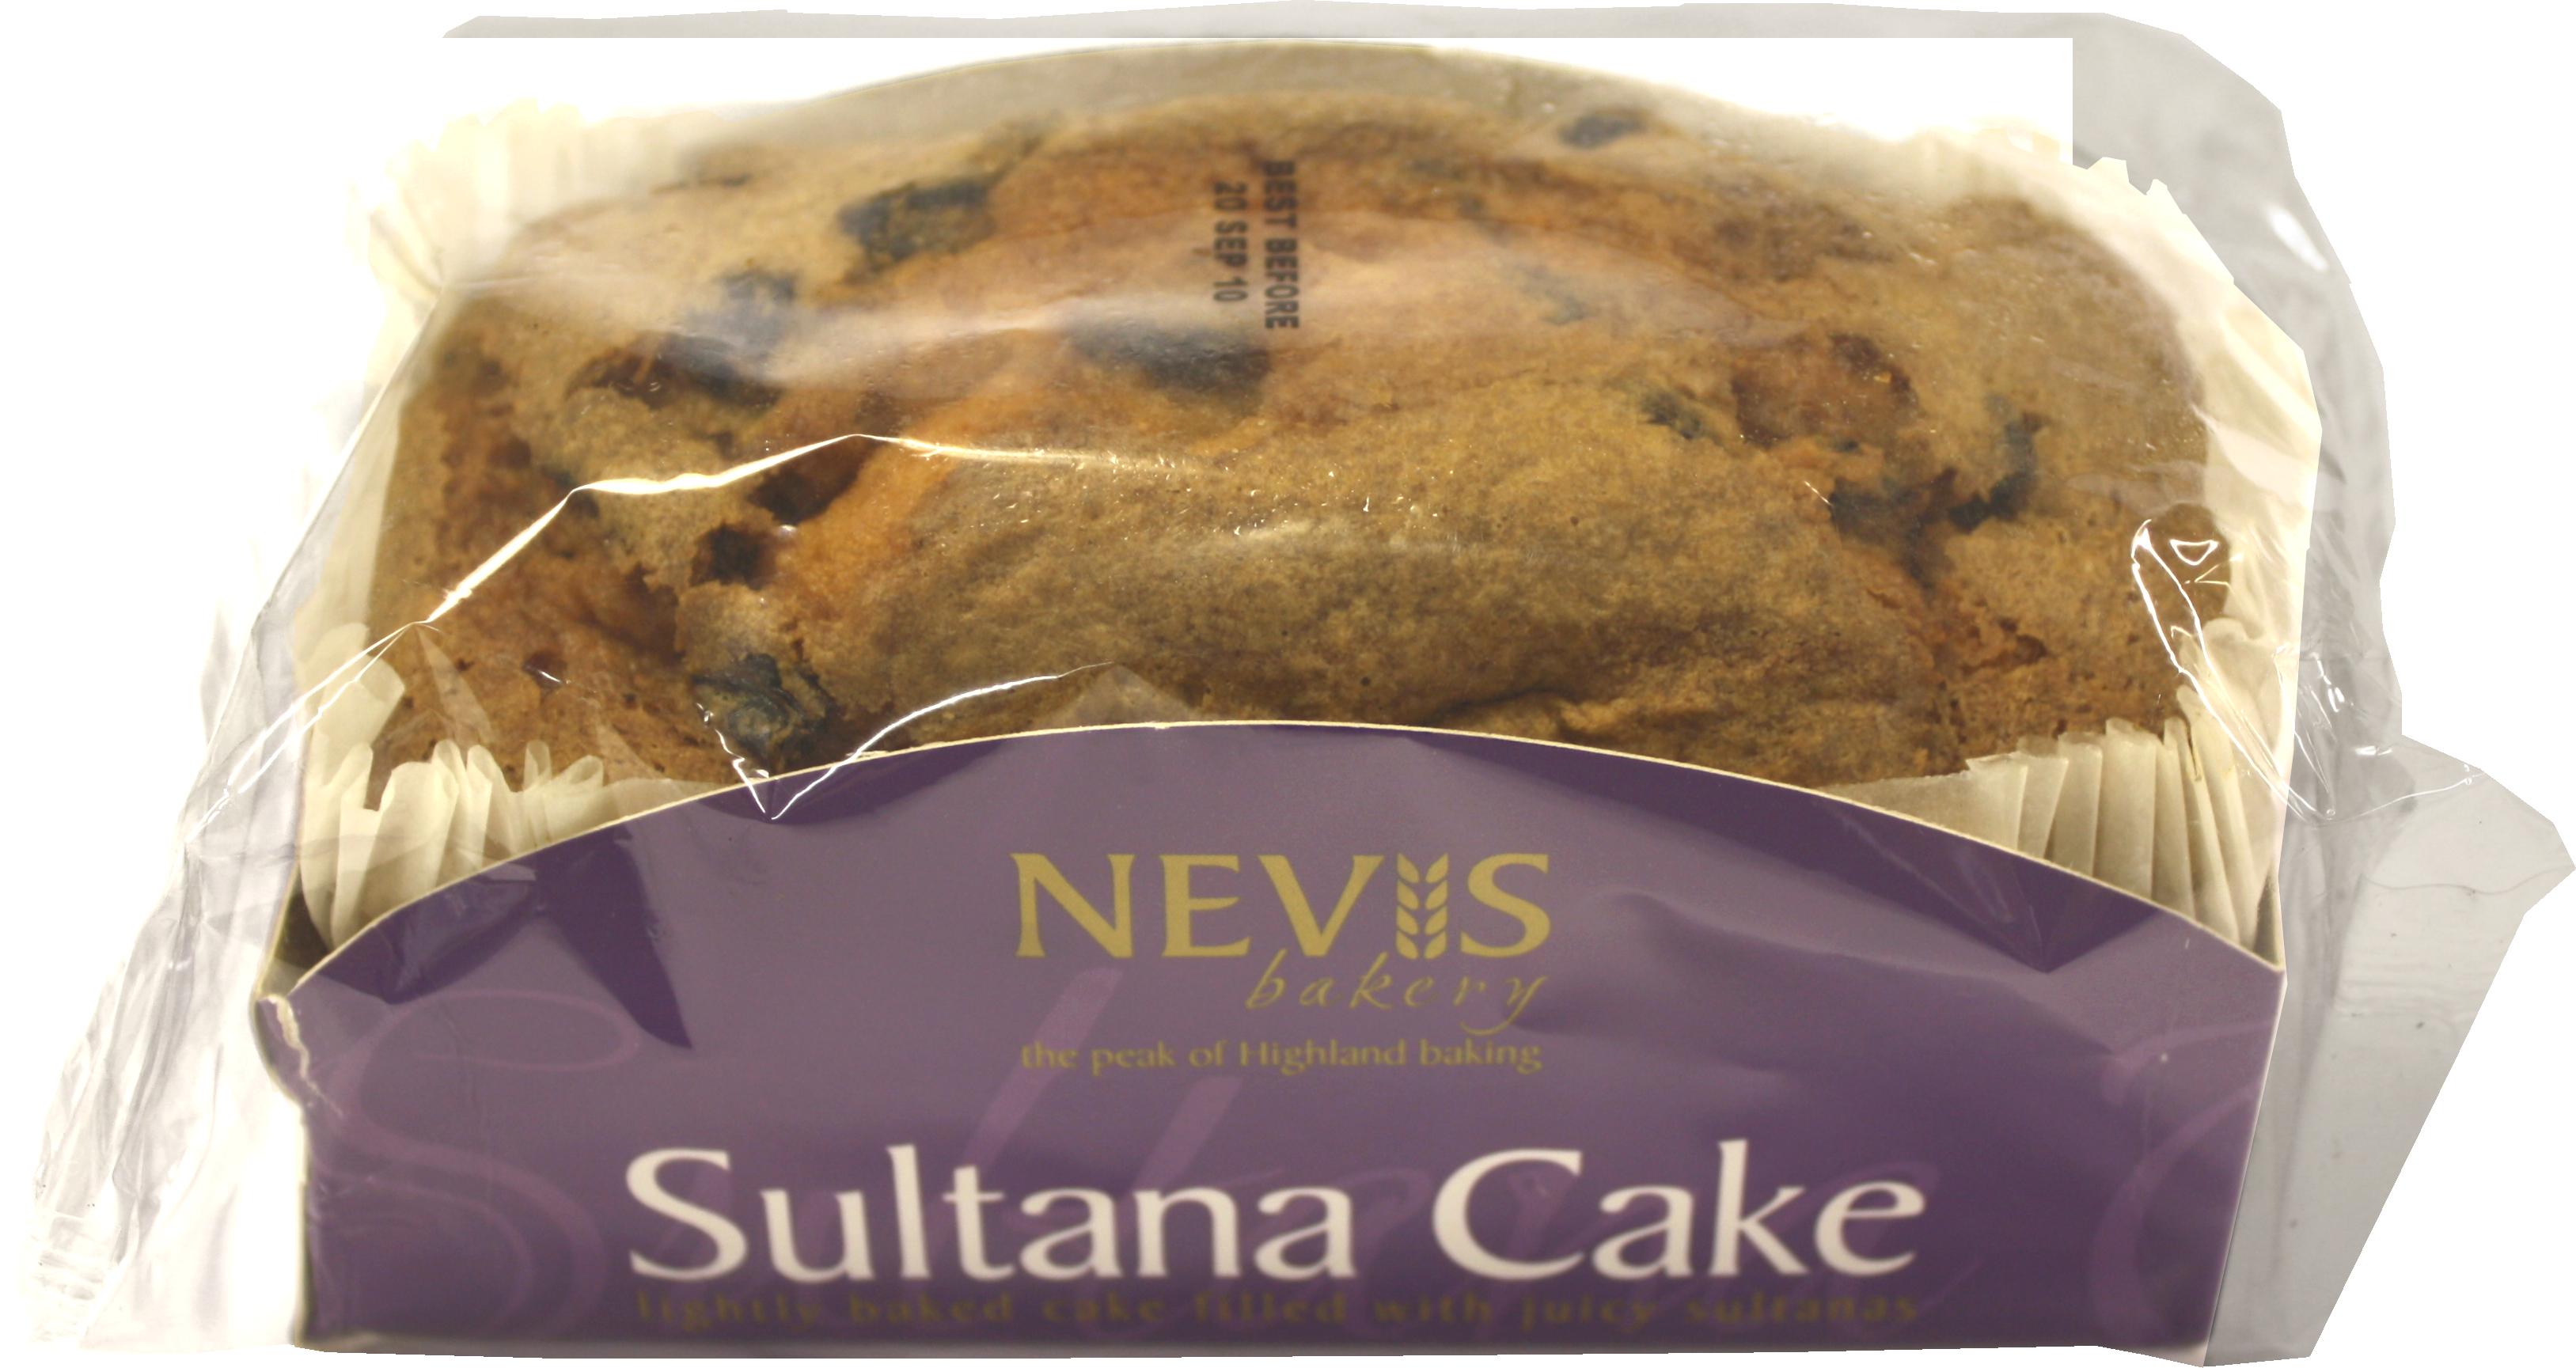 CK 061 Nevis Sultana Cake